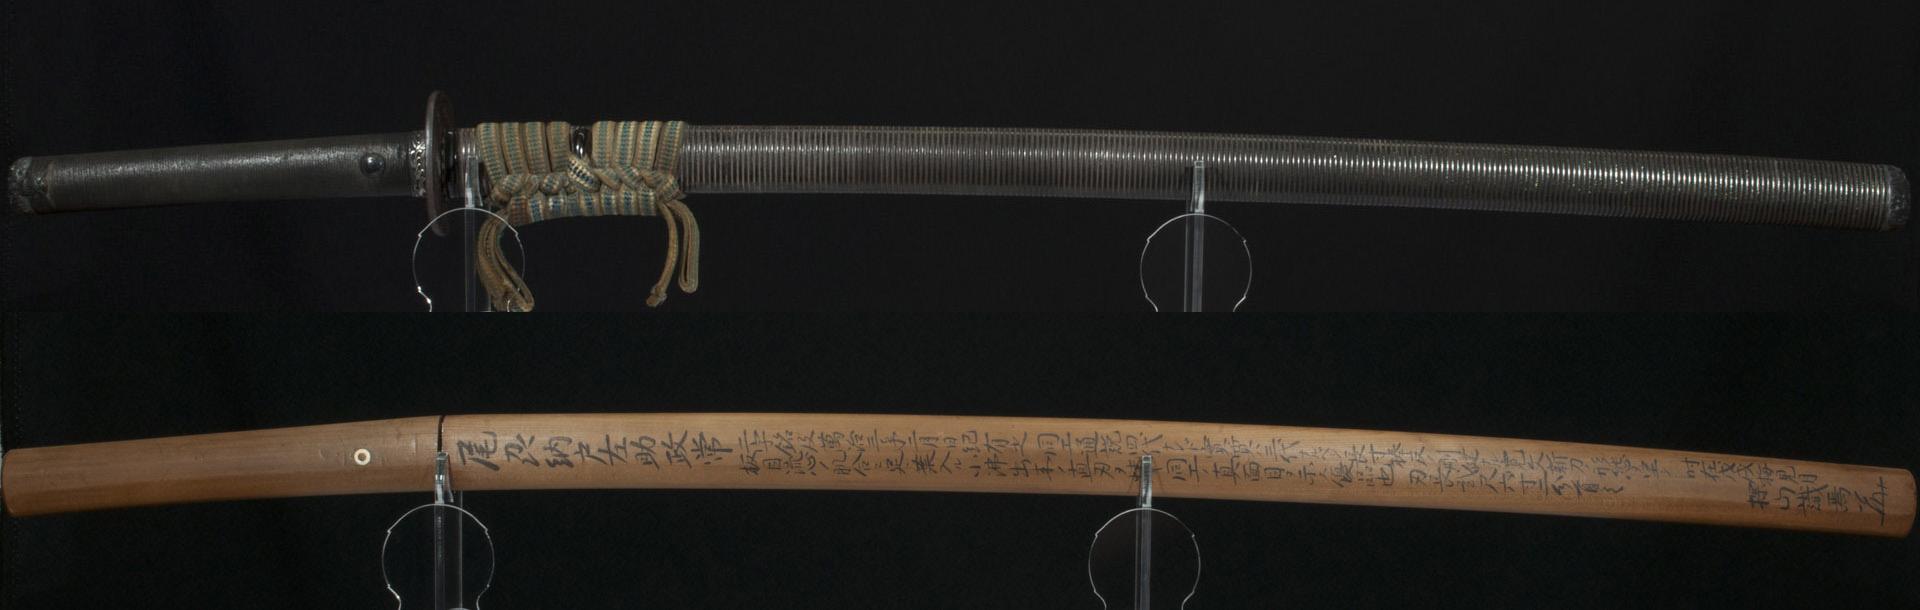 Katana sabre japonais Shinto Masatsune (2)